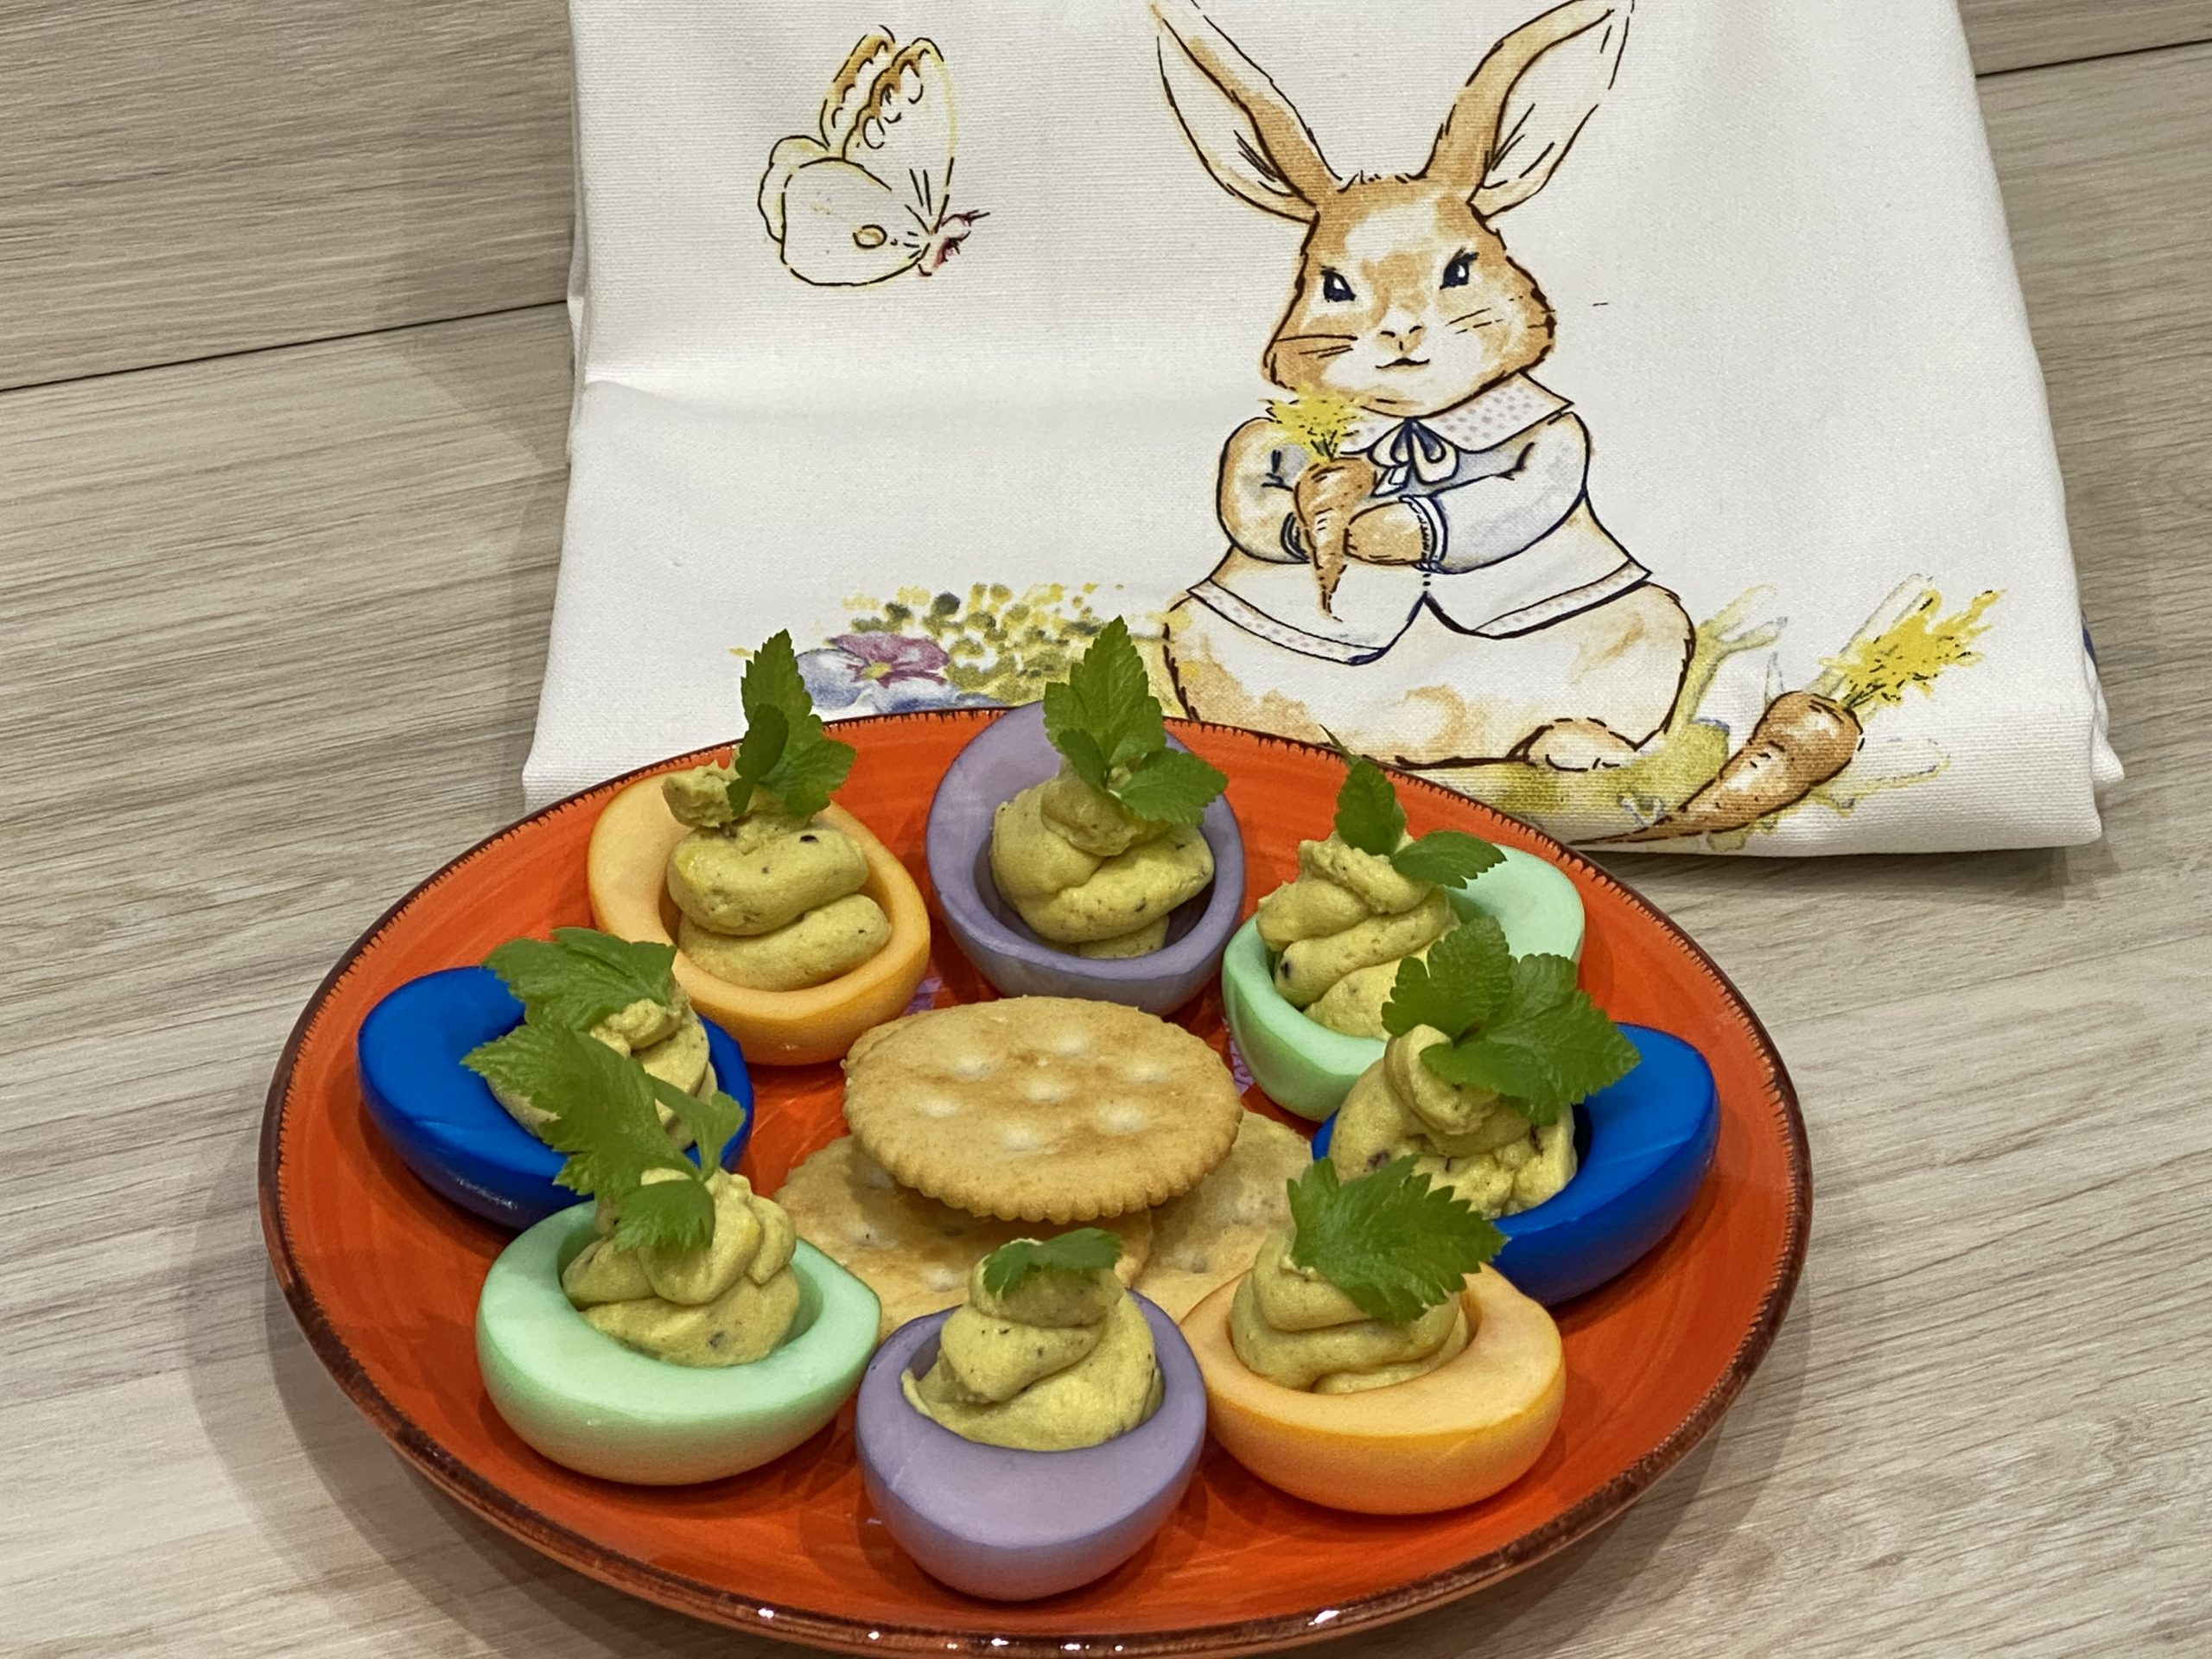 Gefüllte bunte Eier – Colored Deviled Eggs